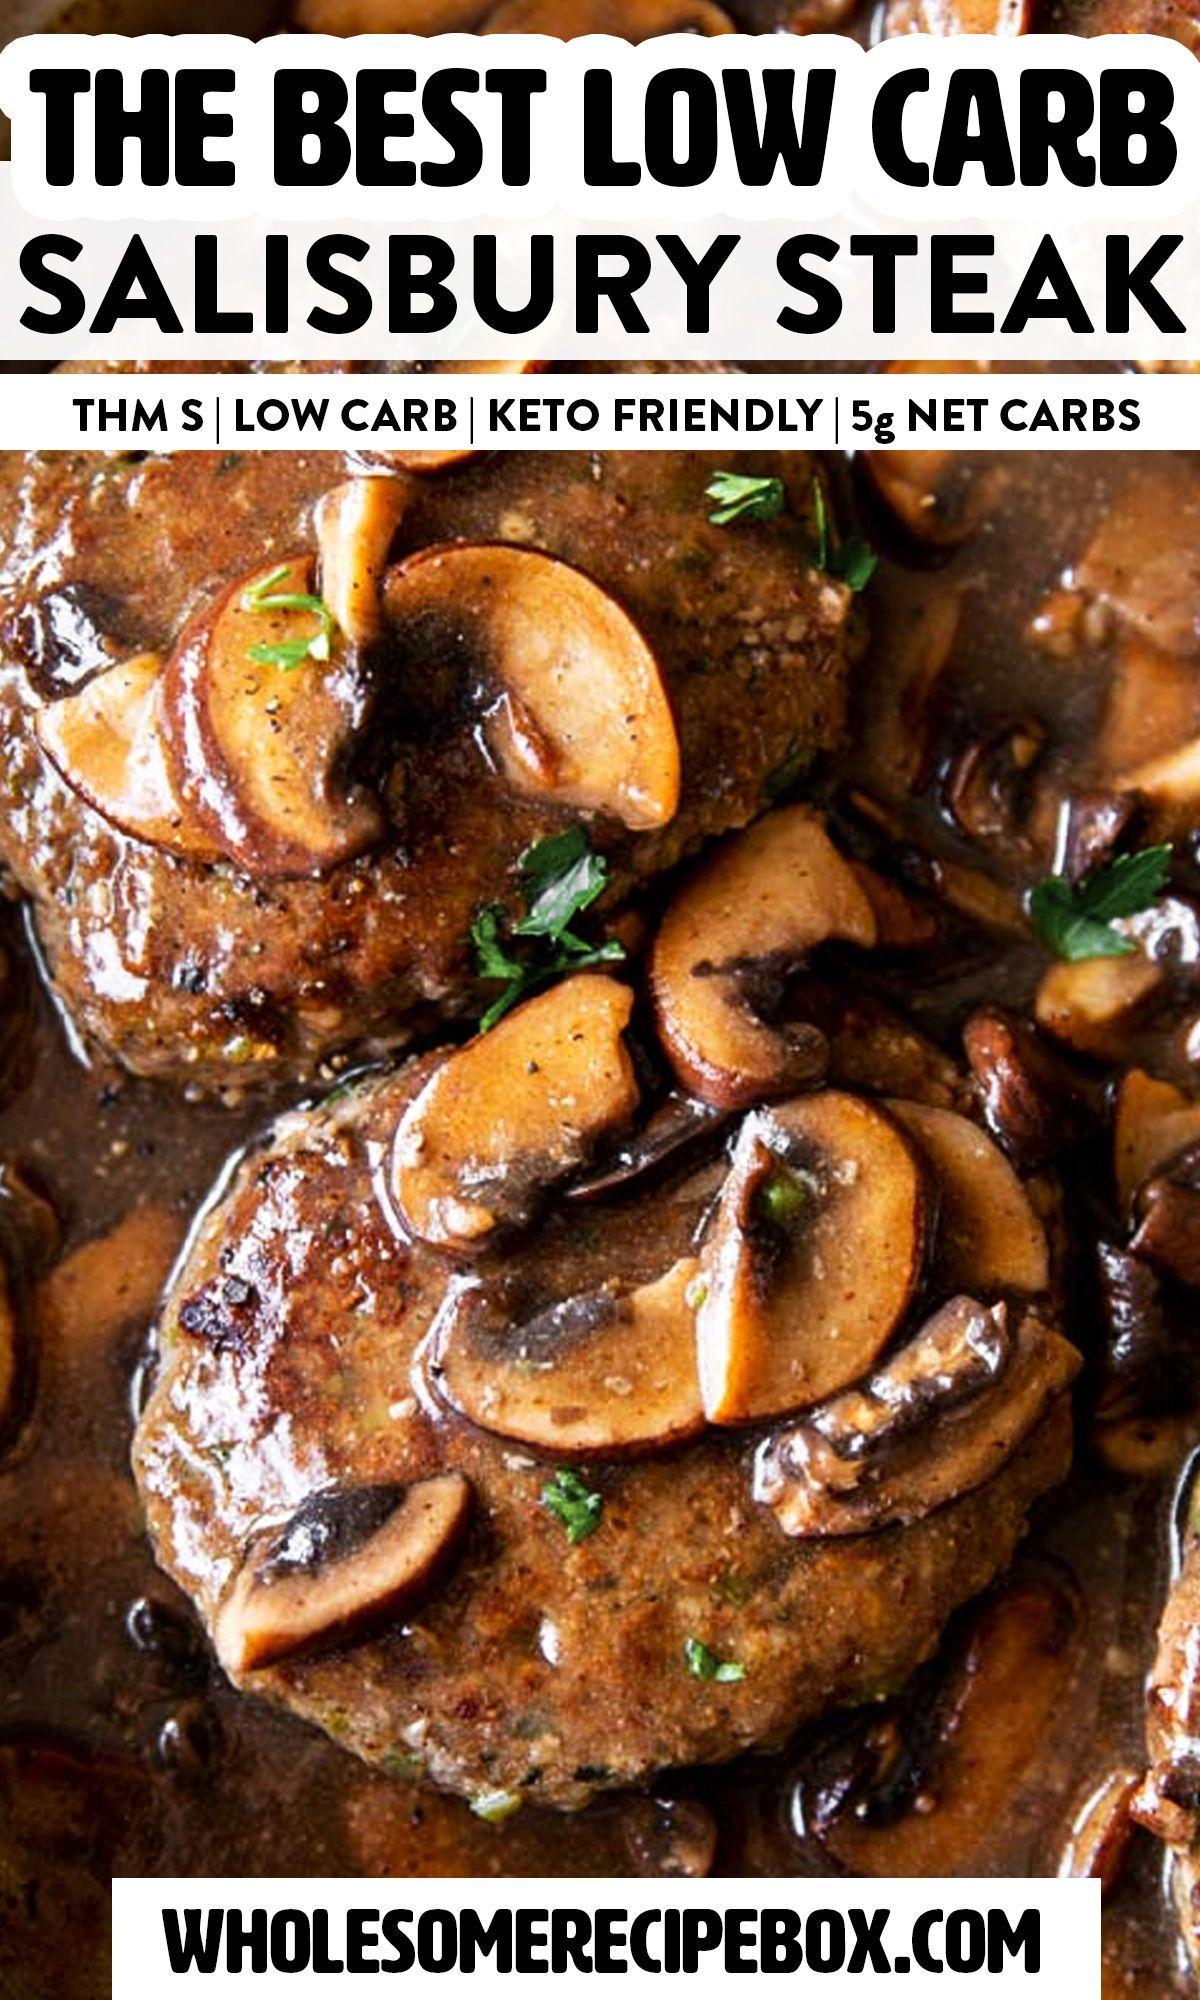 Salisbury Steak With Mushroom Gravy Thm S Low Carb In 2020 Homemade Salisbury Steak Comfort Food Recipes Dinners Salisbury Steak Recipes